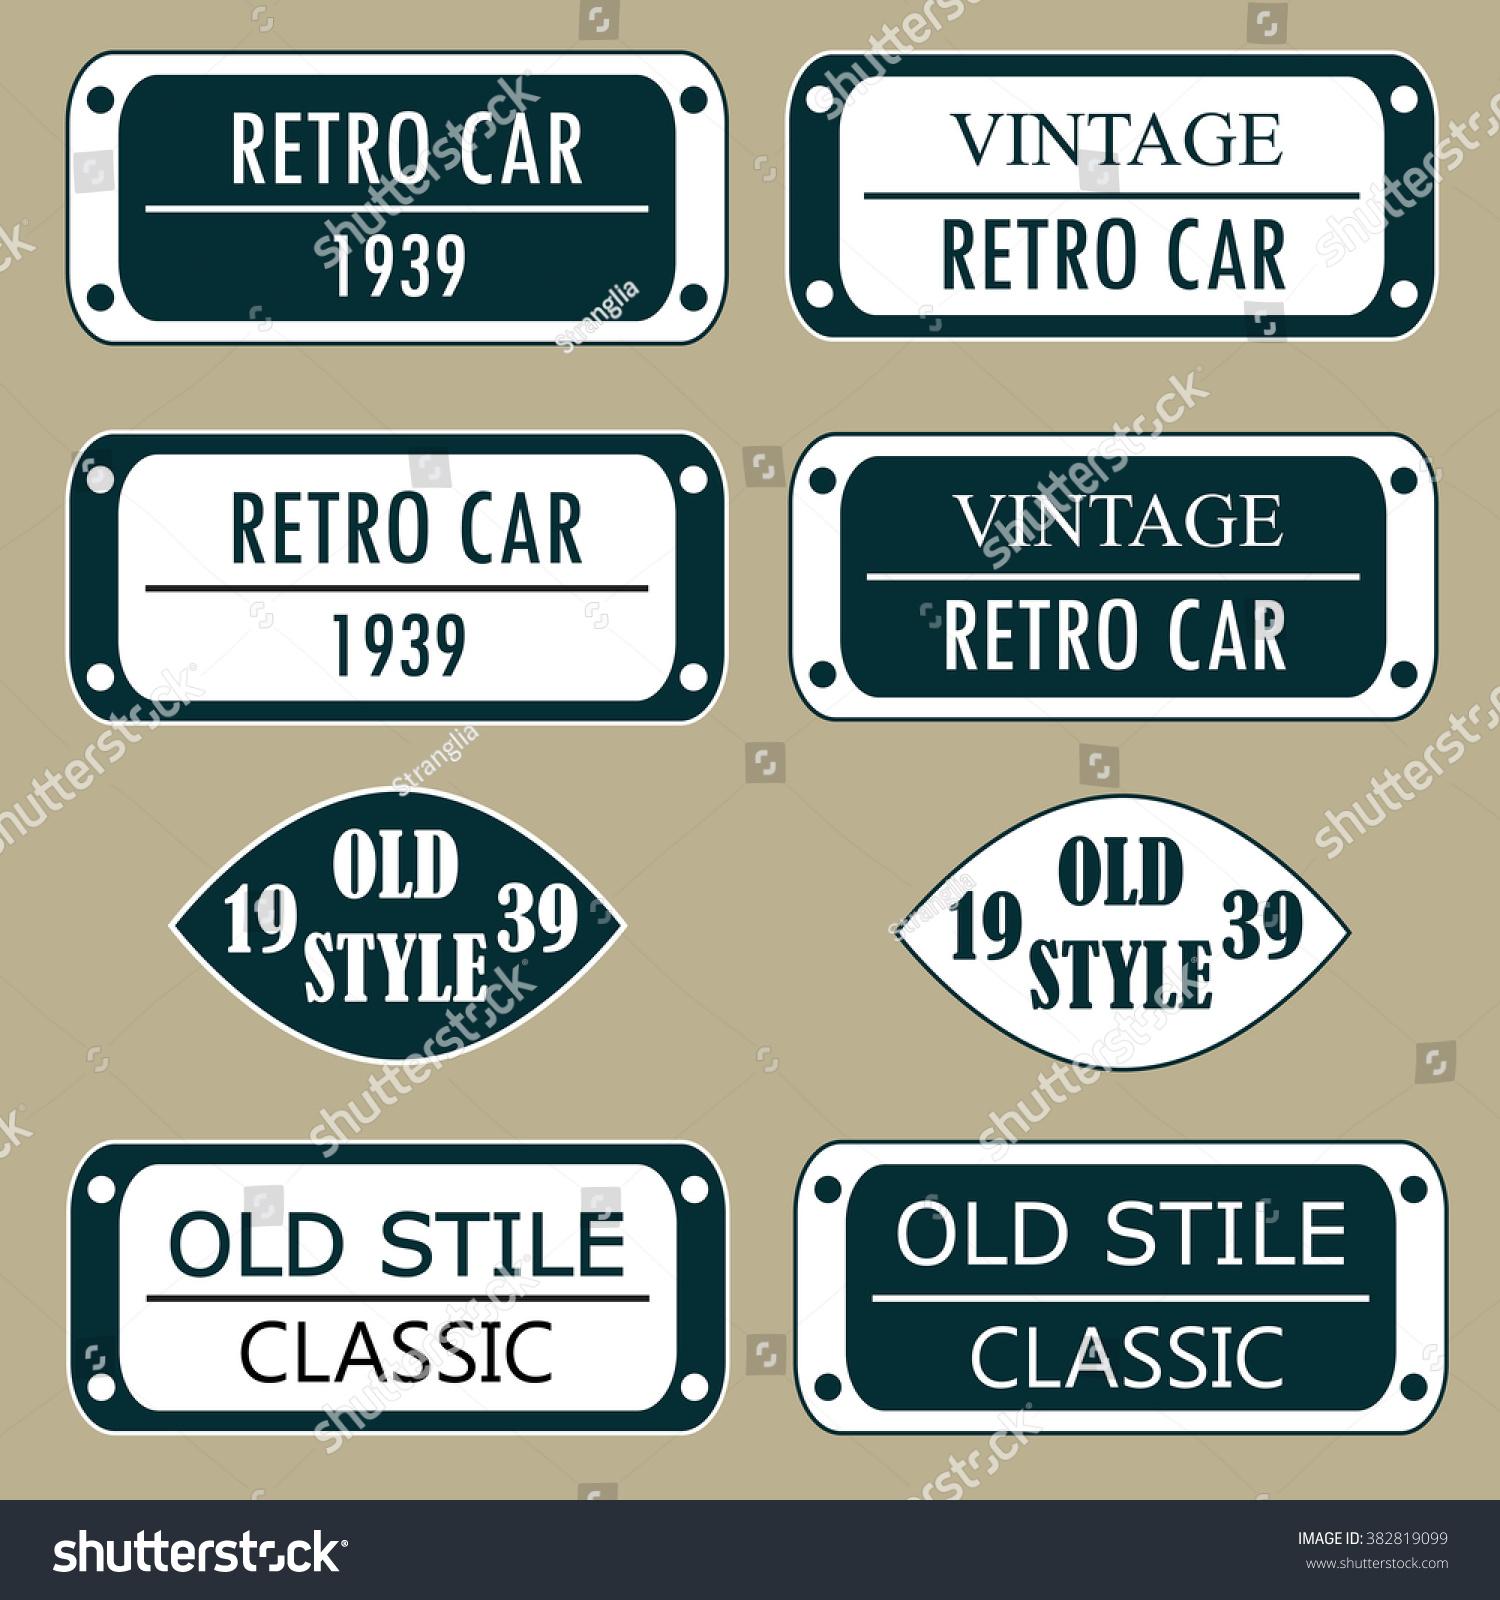 Значка для ретро автомобили 3